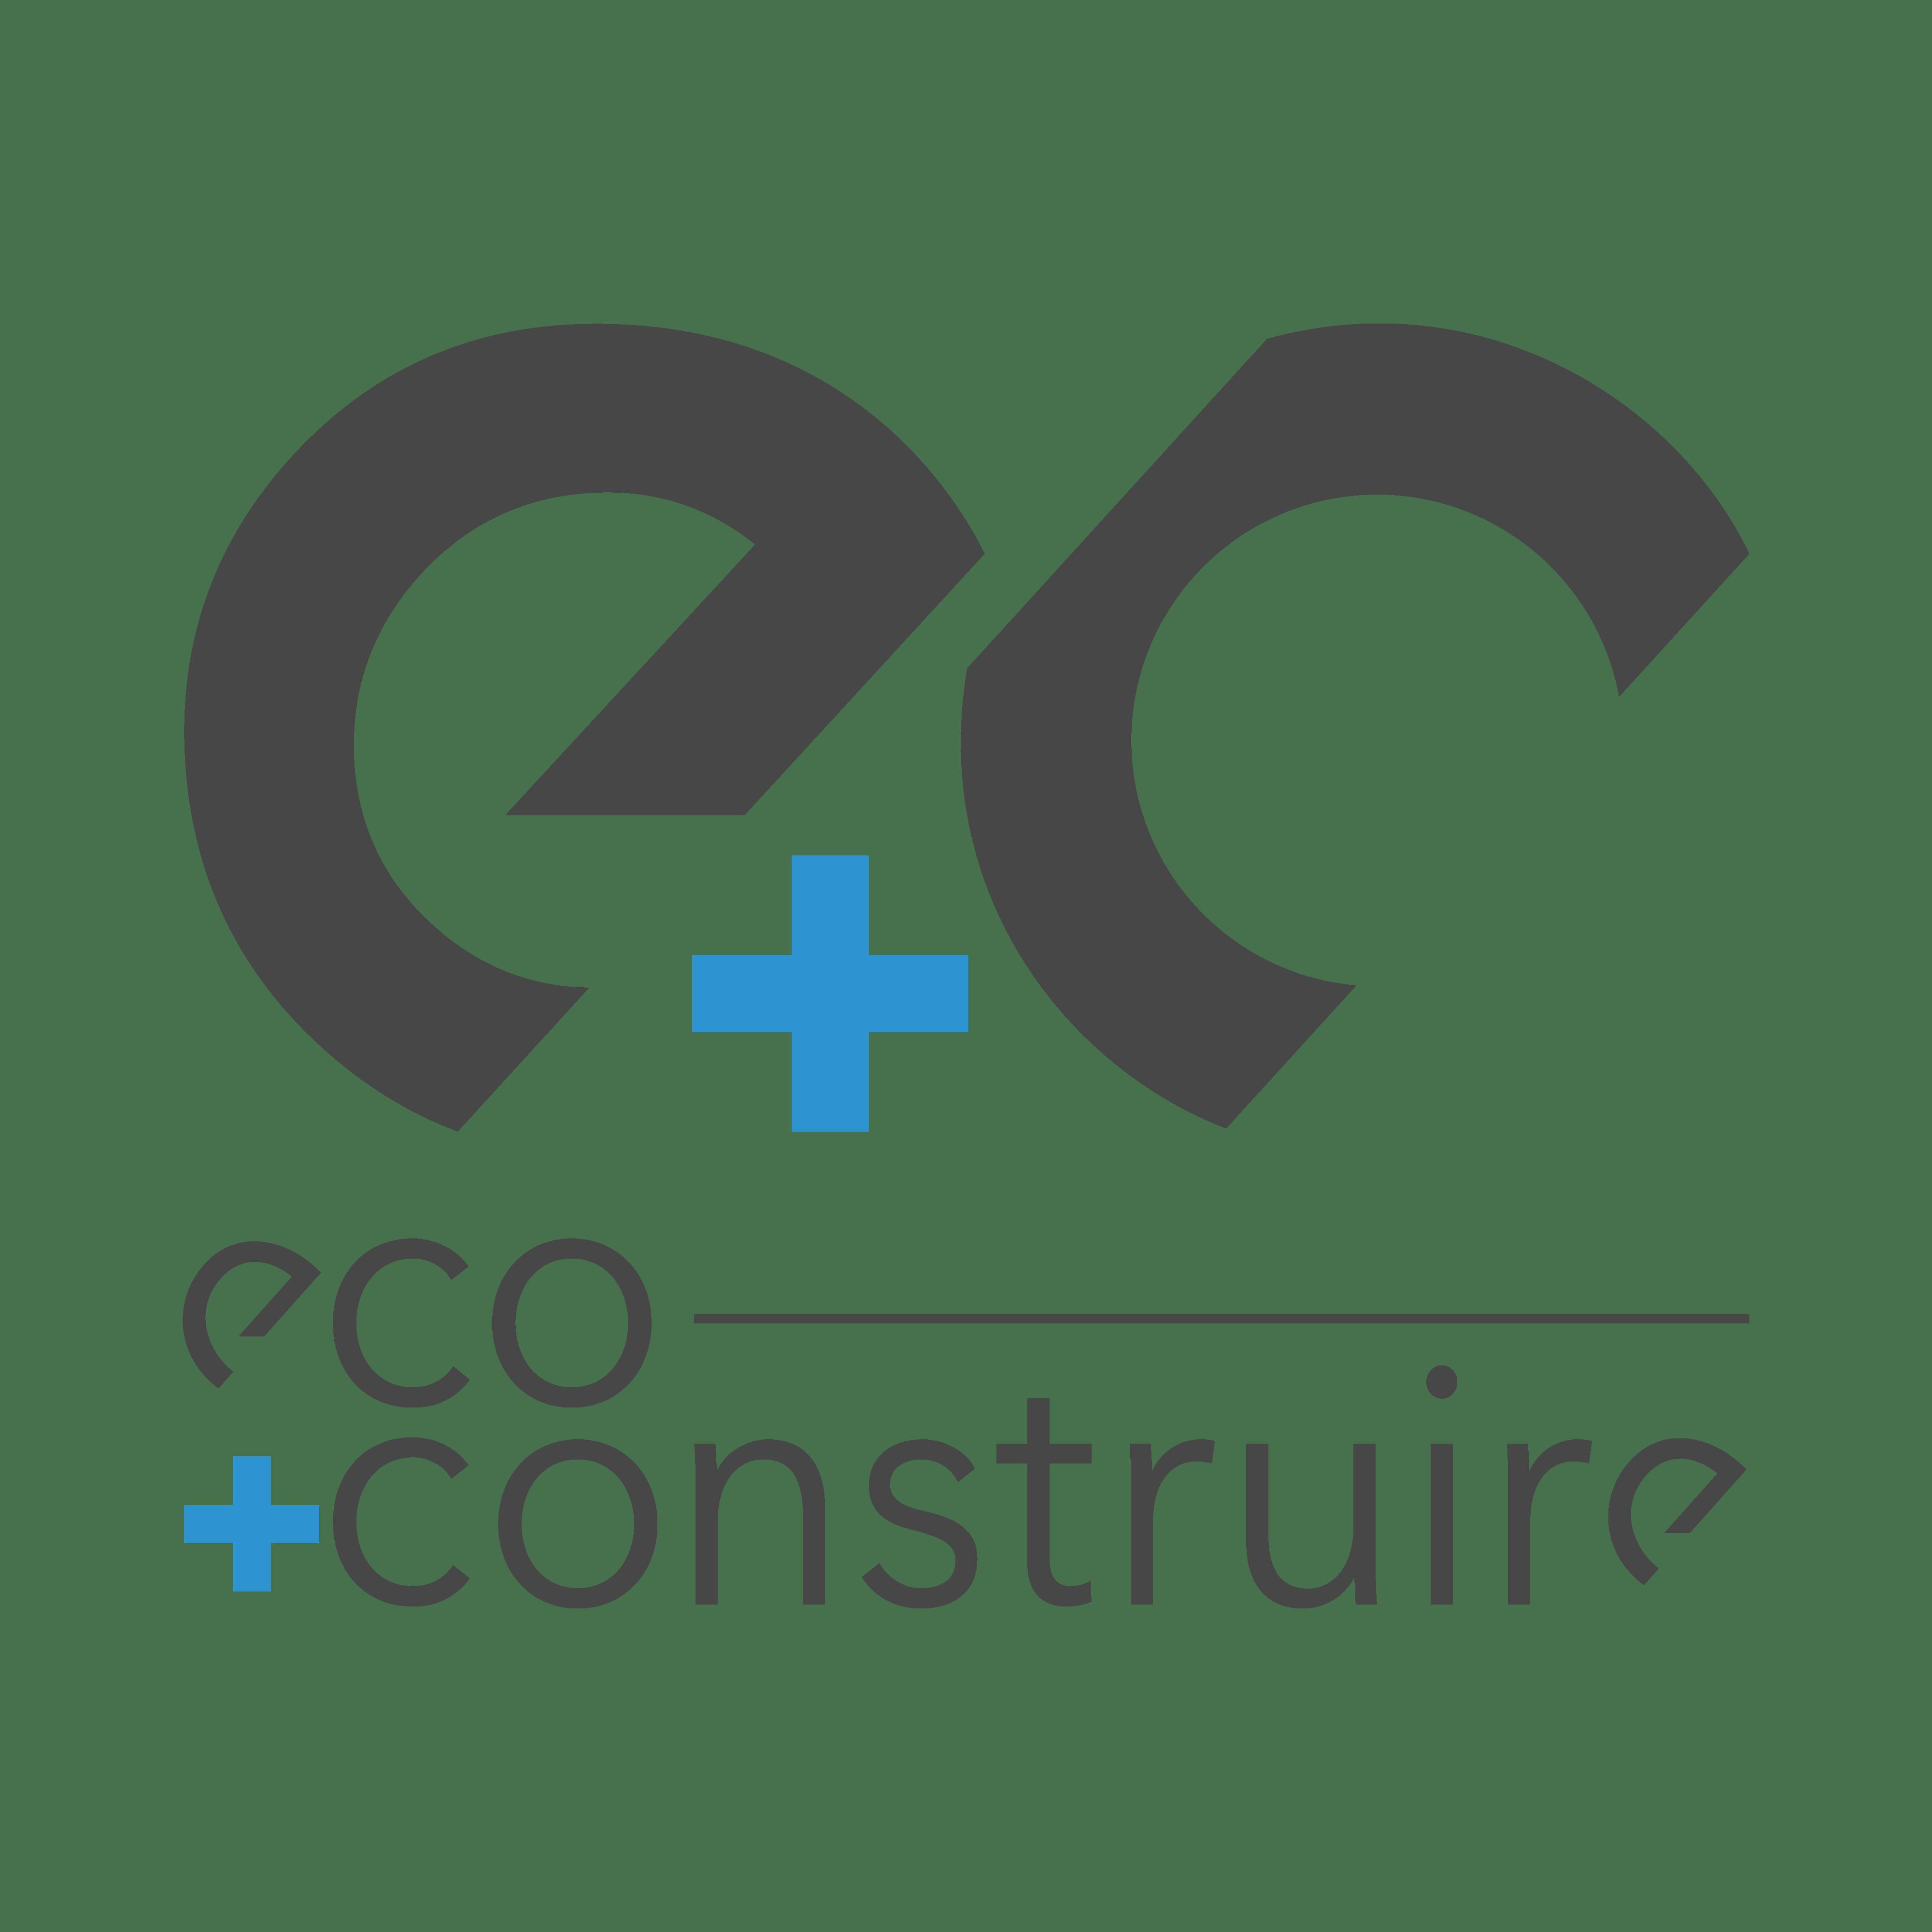 LOGO Membres Construct Lab Eco+